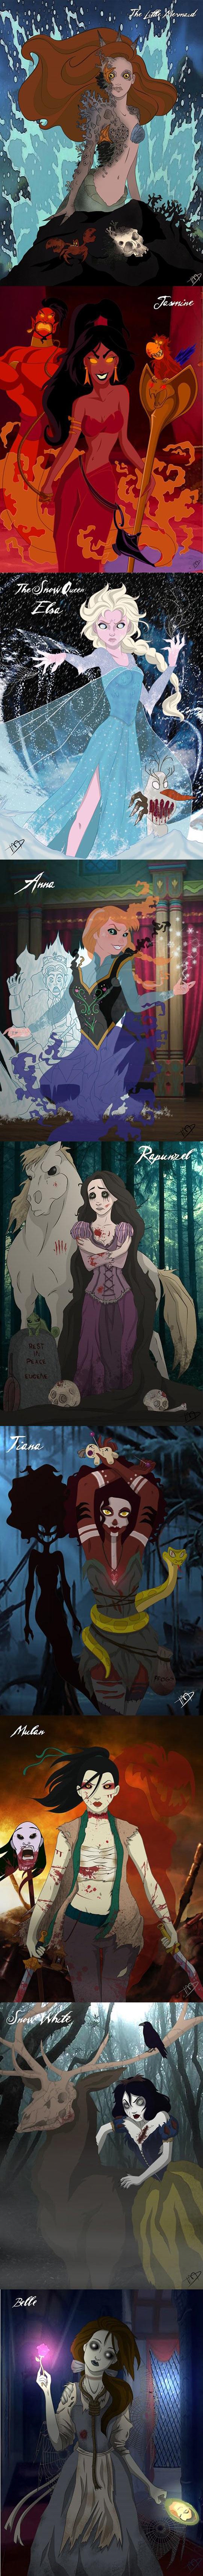 cool-zombie-Disney-princesses-Ariel